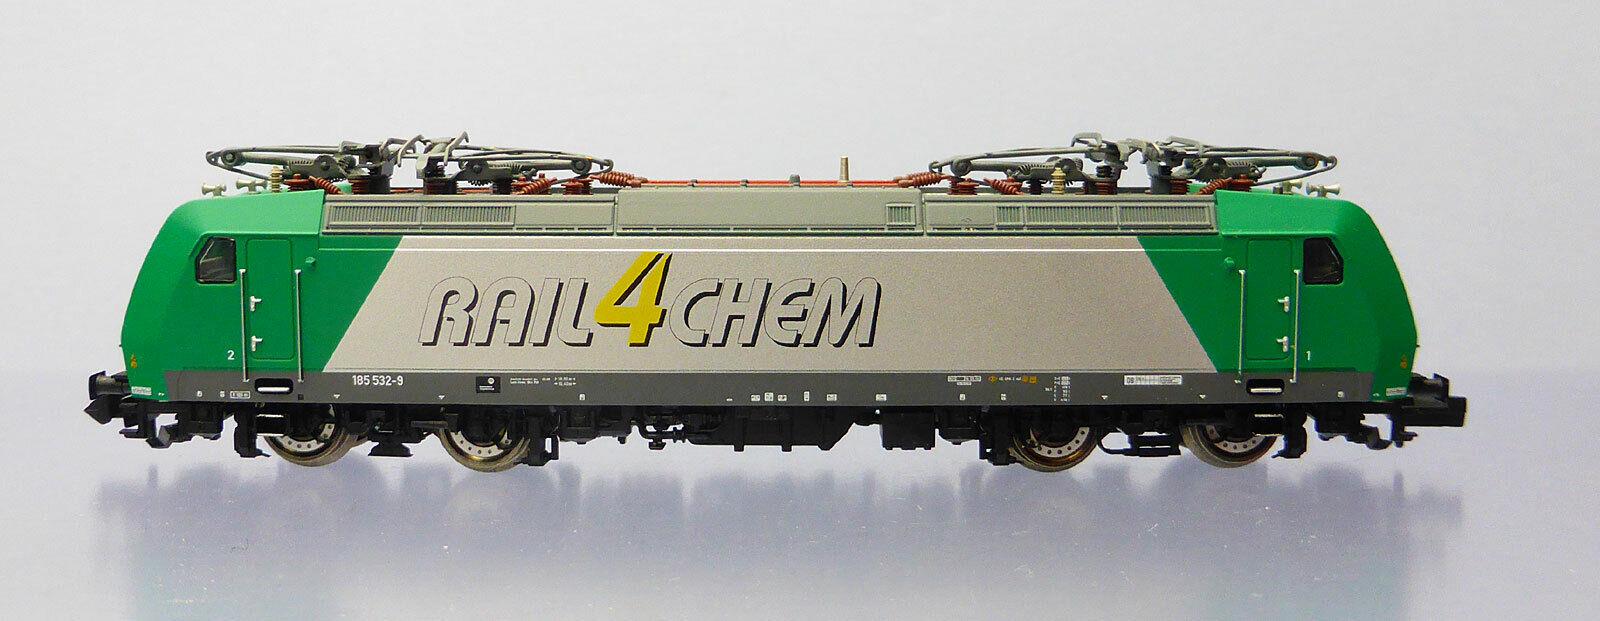 Fleischmann n 85 7385; ellokbr 185 de la Rail 4 Chem, DSS, sin usar en OVP j121